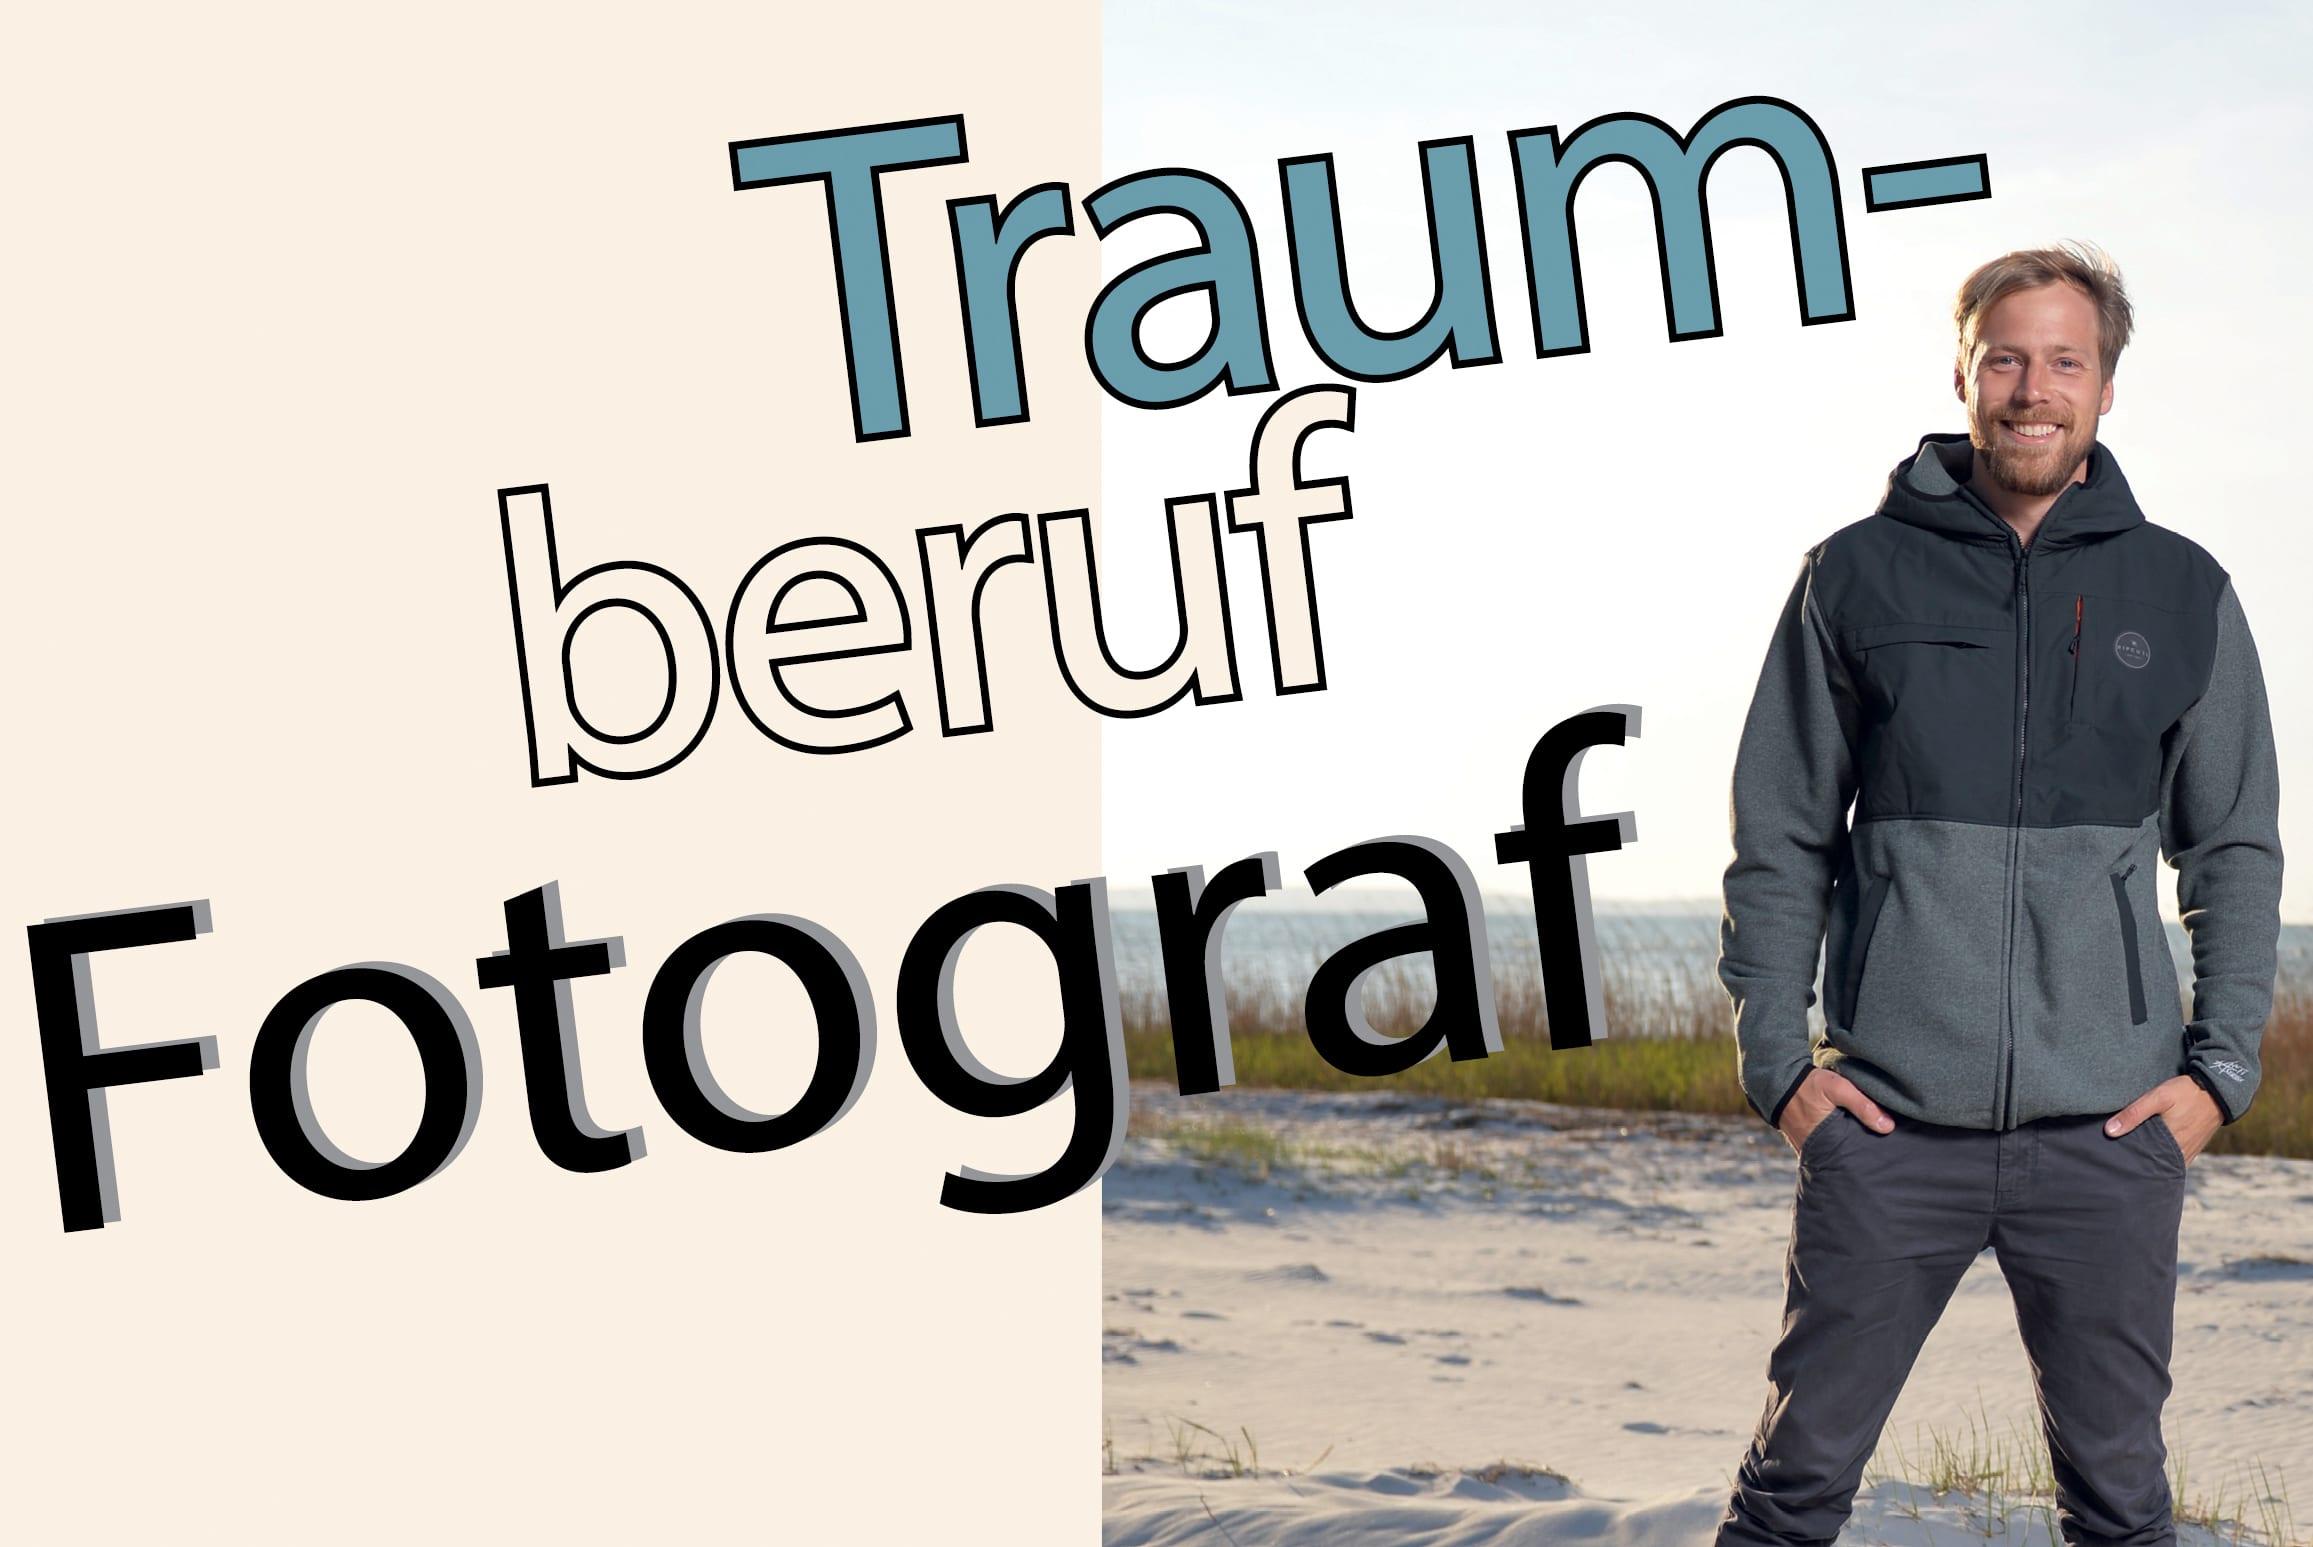 Traumberuf: Fotograf